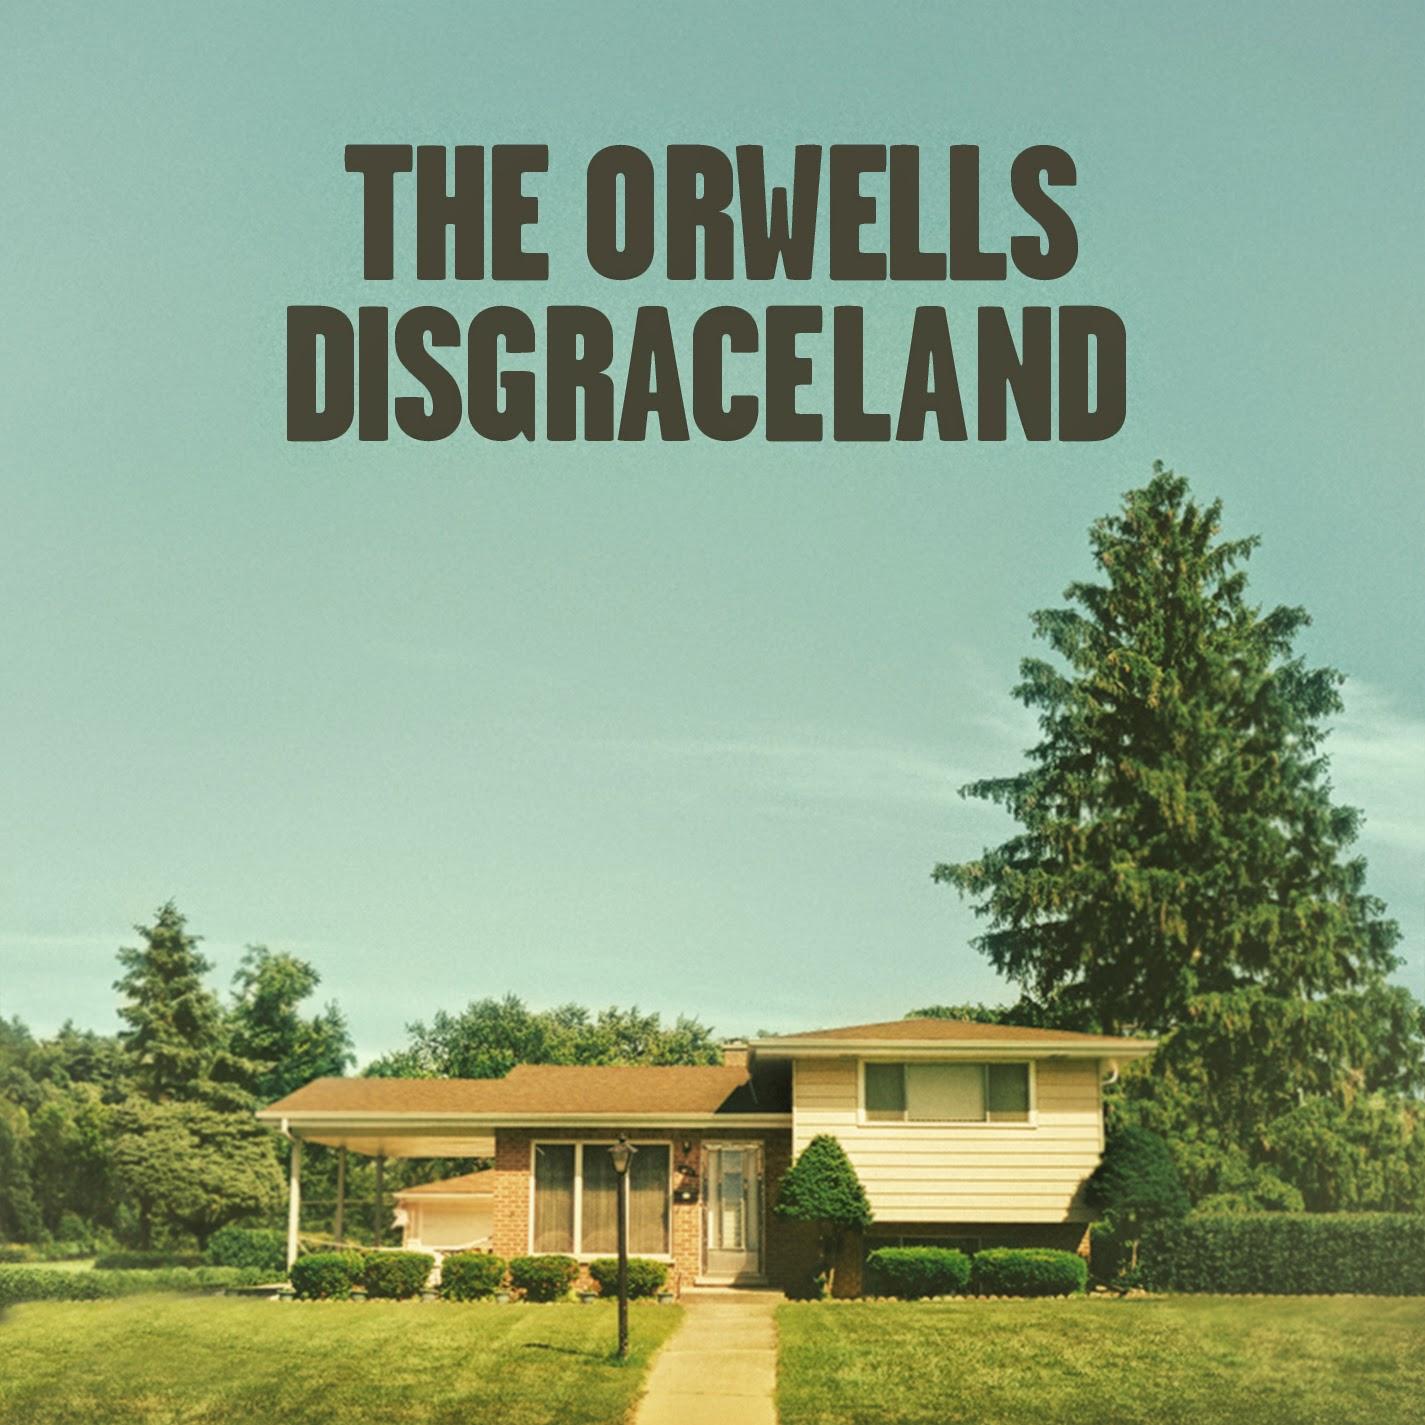 THE ORWELLS - (2014) Disgraceland